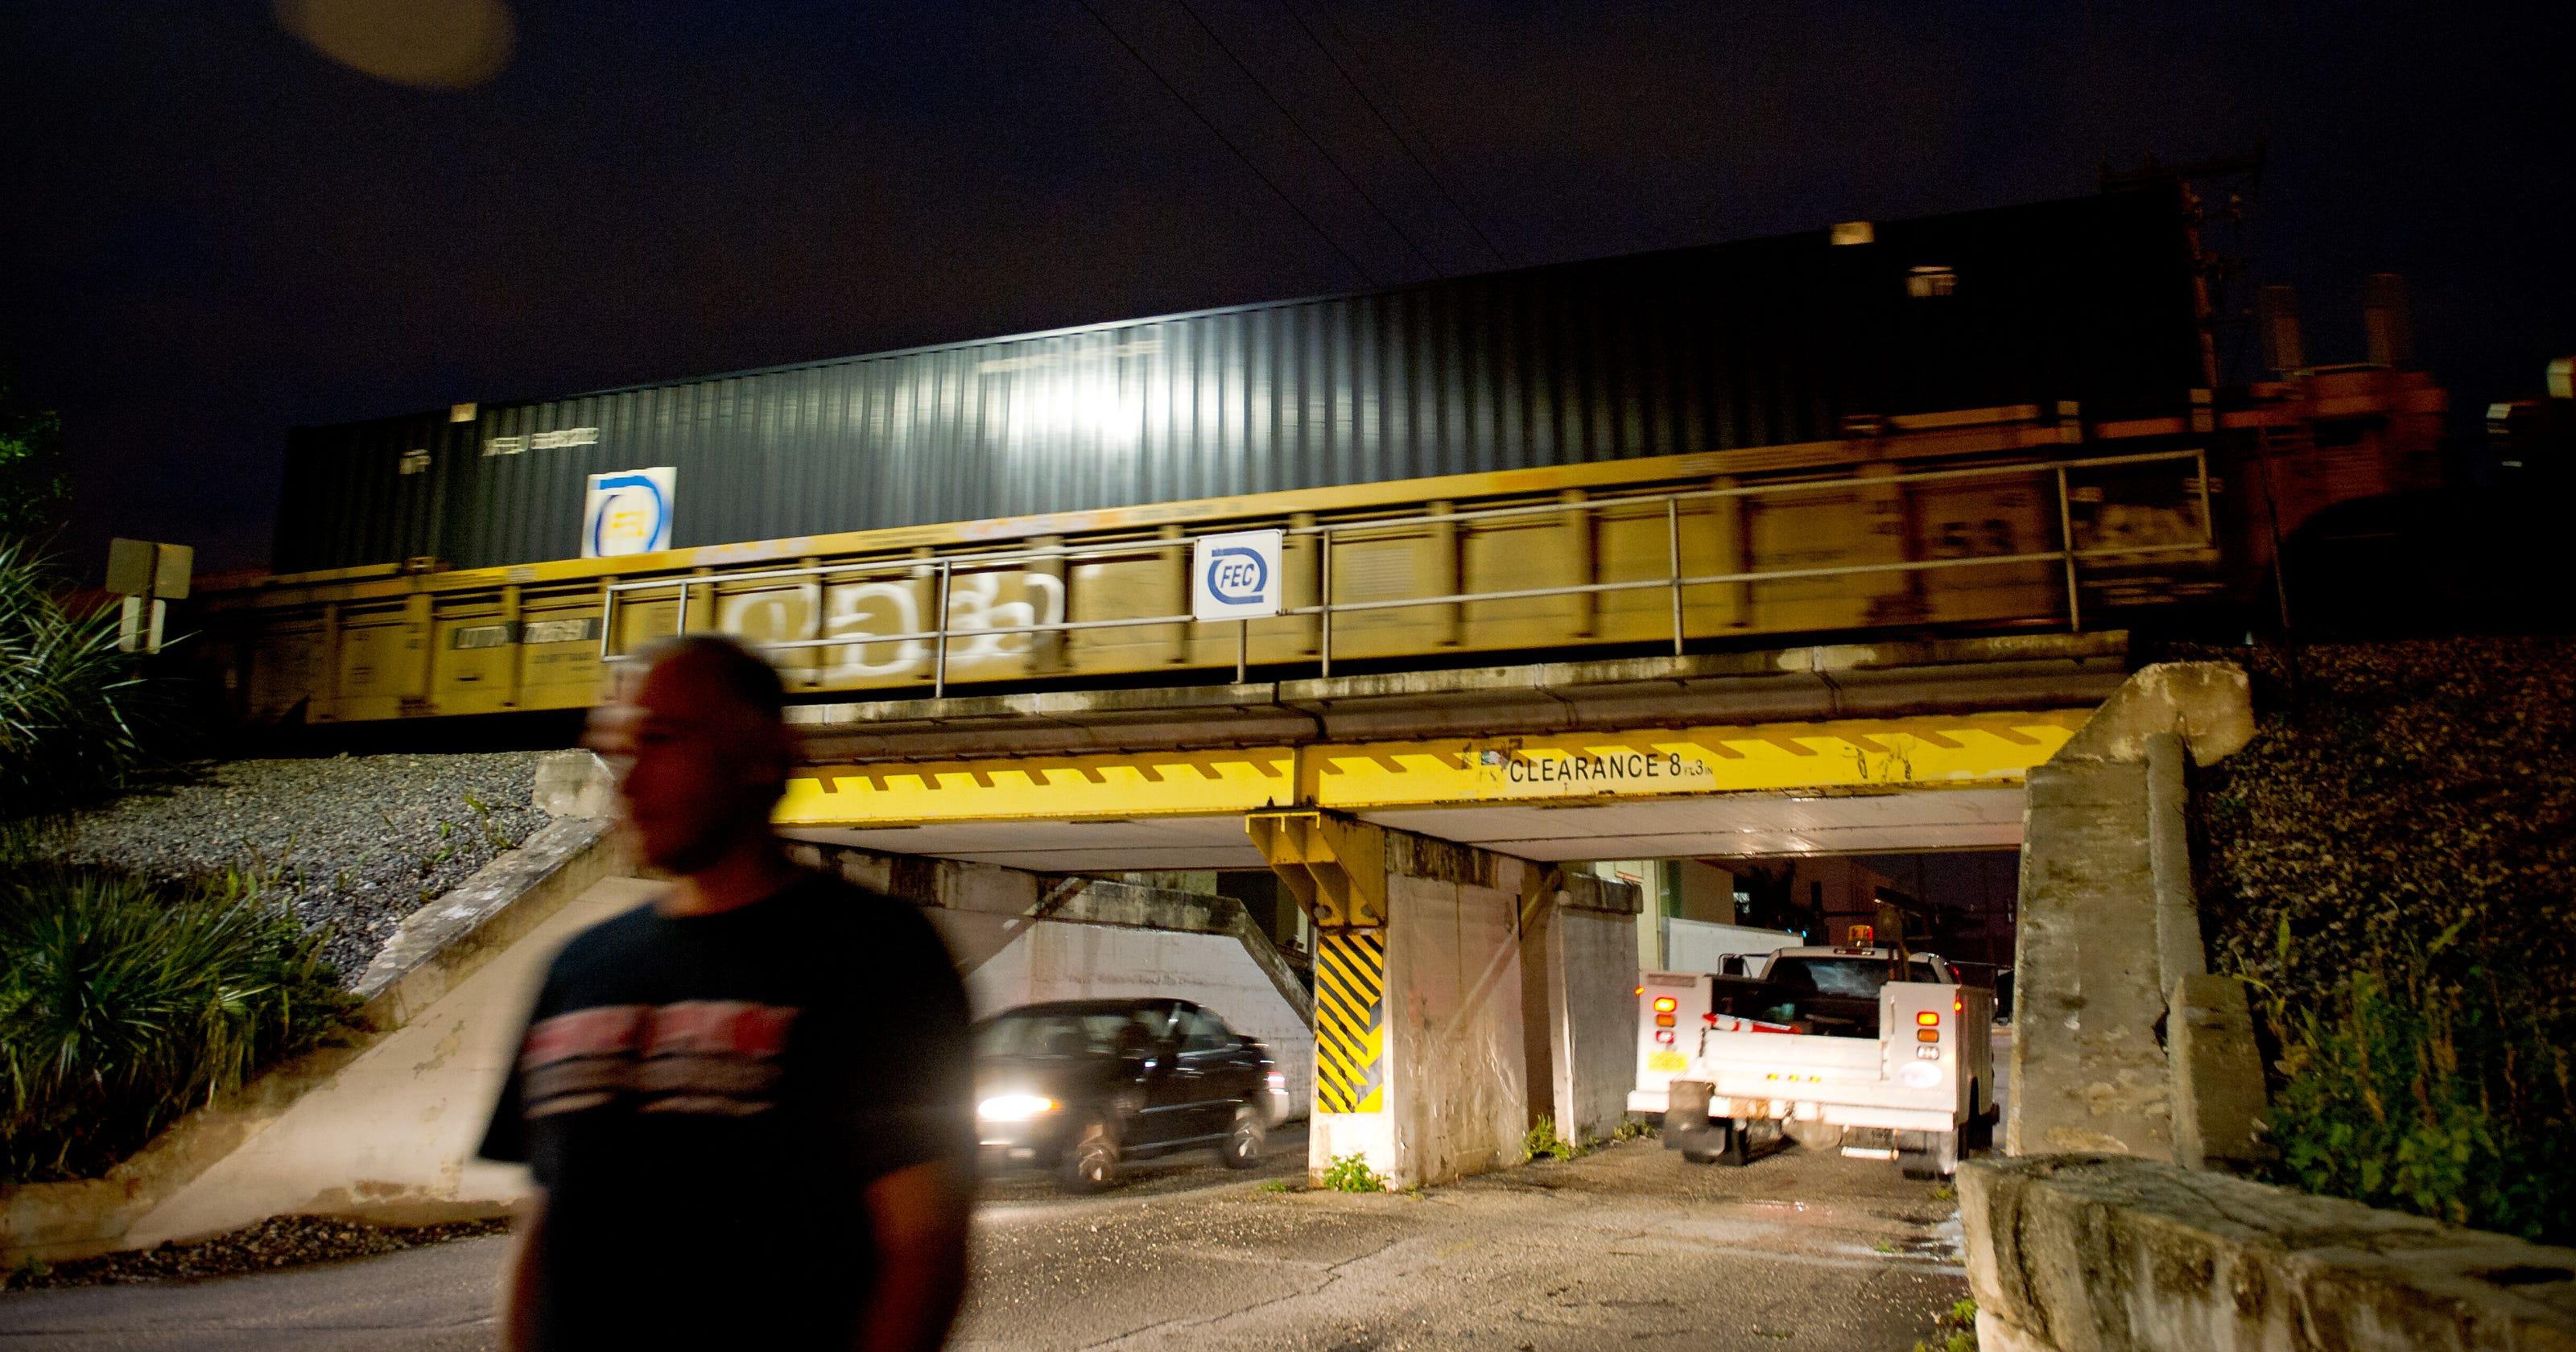 Florida East Coast Railway, Brightline have seen 76 deaths